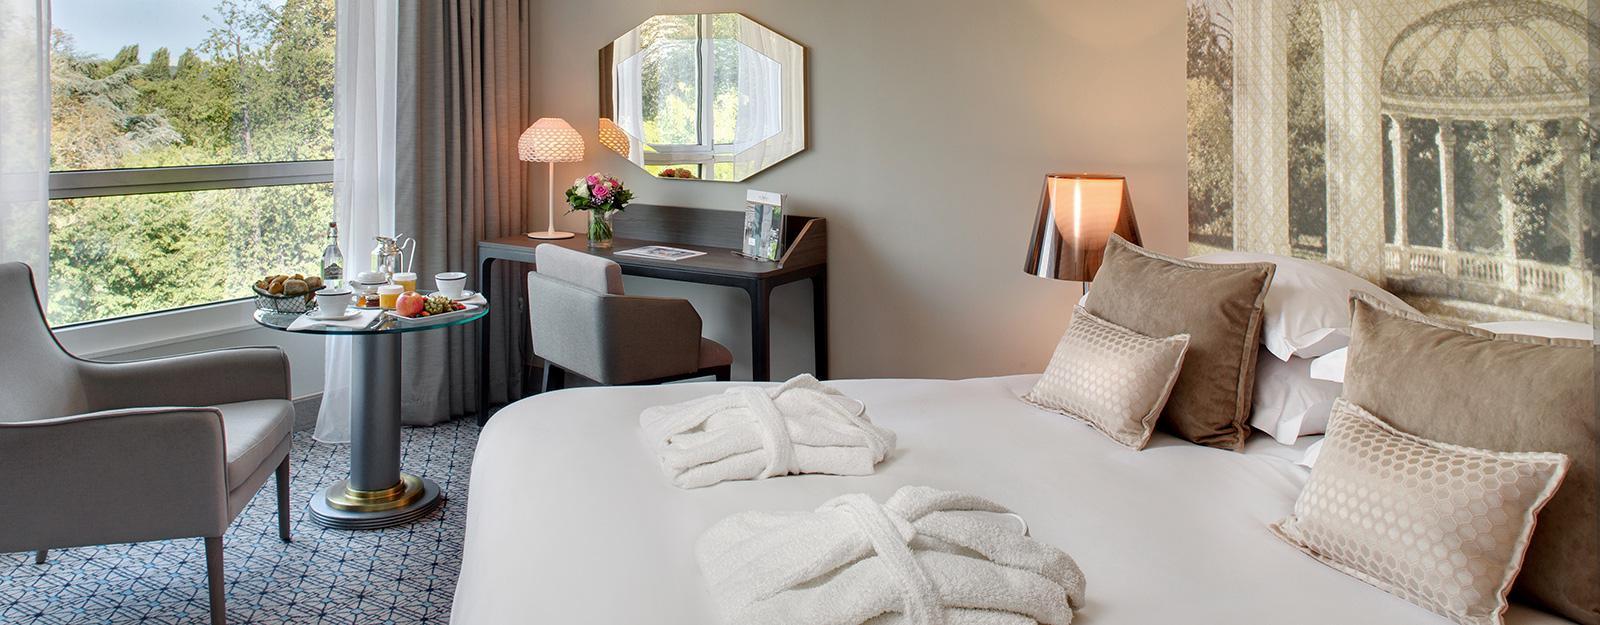 hotel-de-luxe-auvergne-france-vichy-chambre